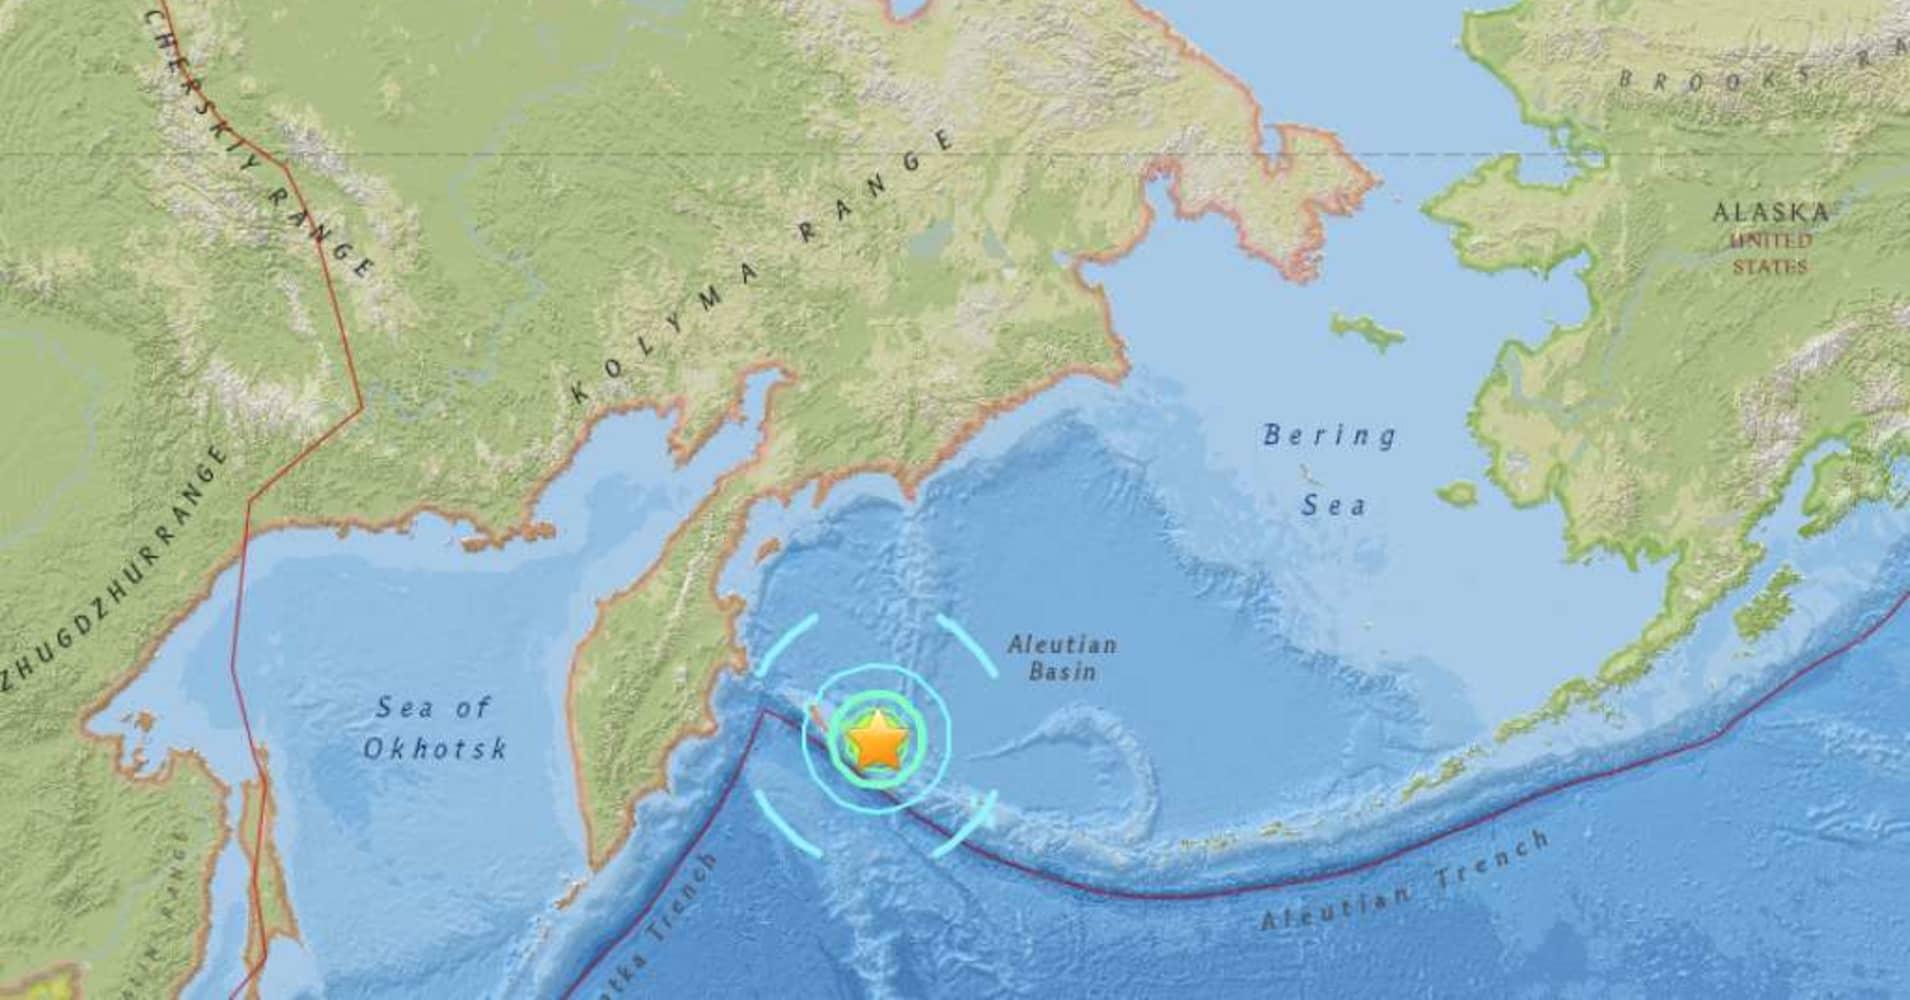 Powerful quake strikes off Russia's Far East, says USGS